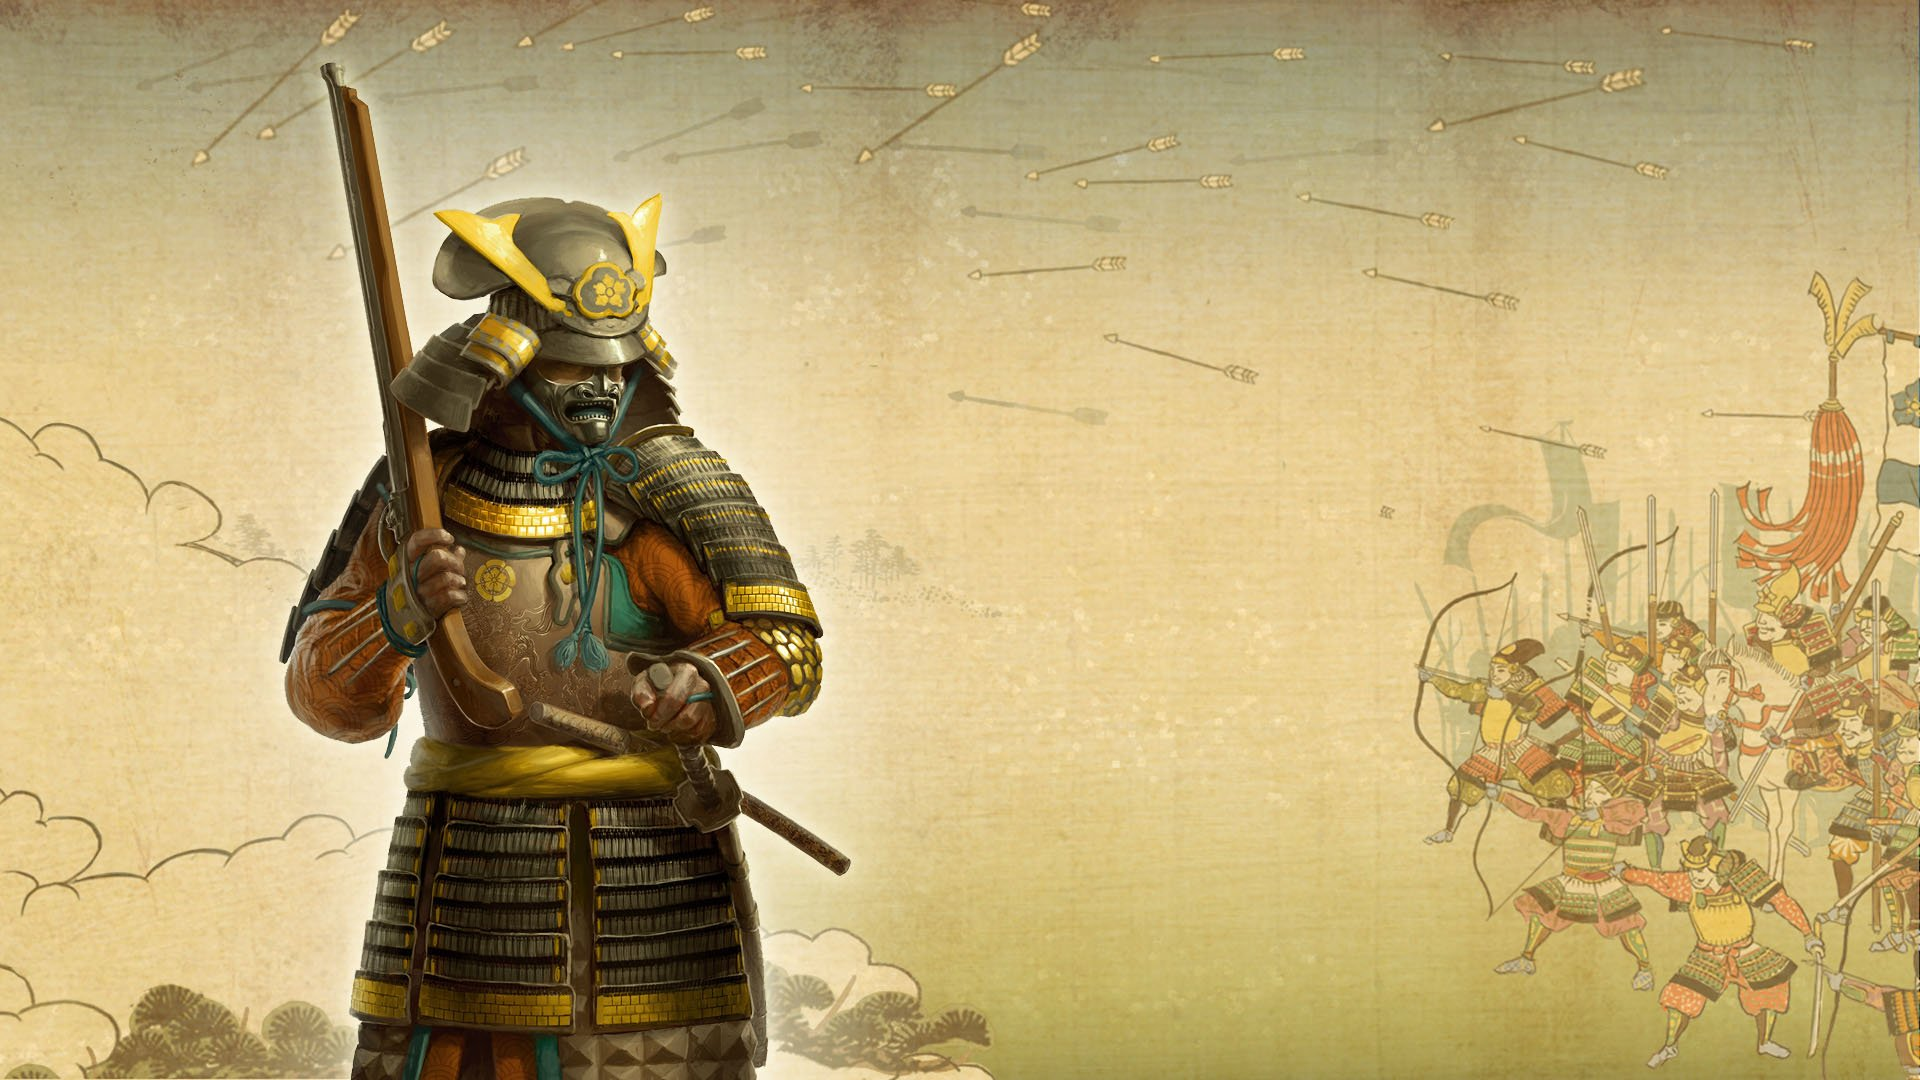 Total War: Shogun 2 Full HD Wallpaper and Background | 1920x1200 ...